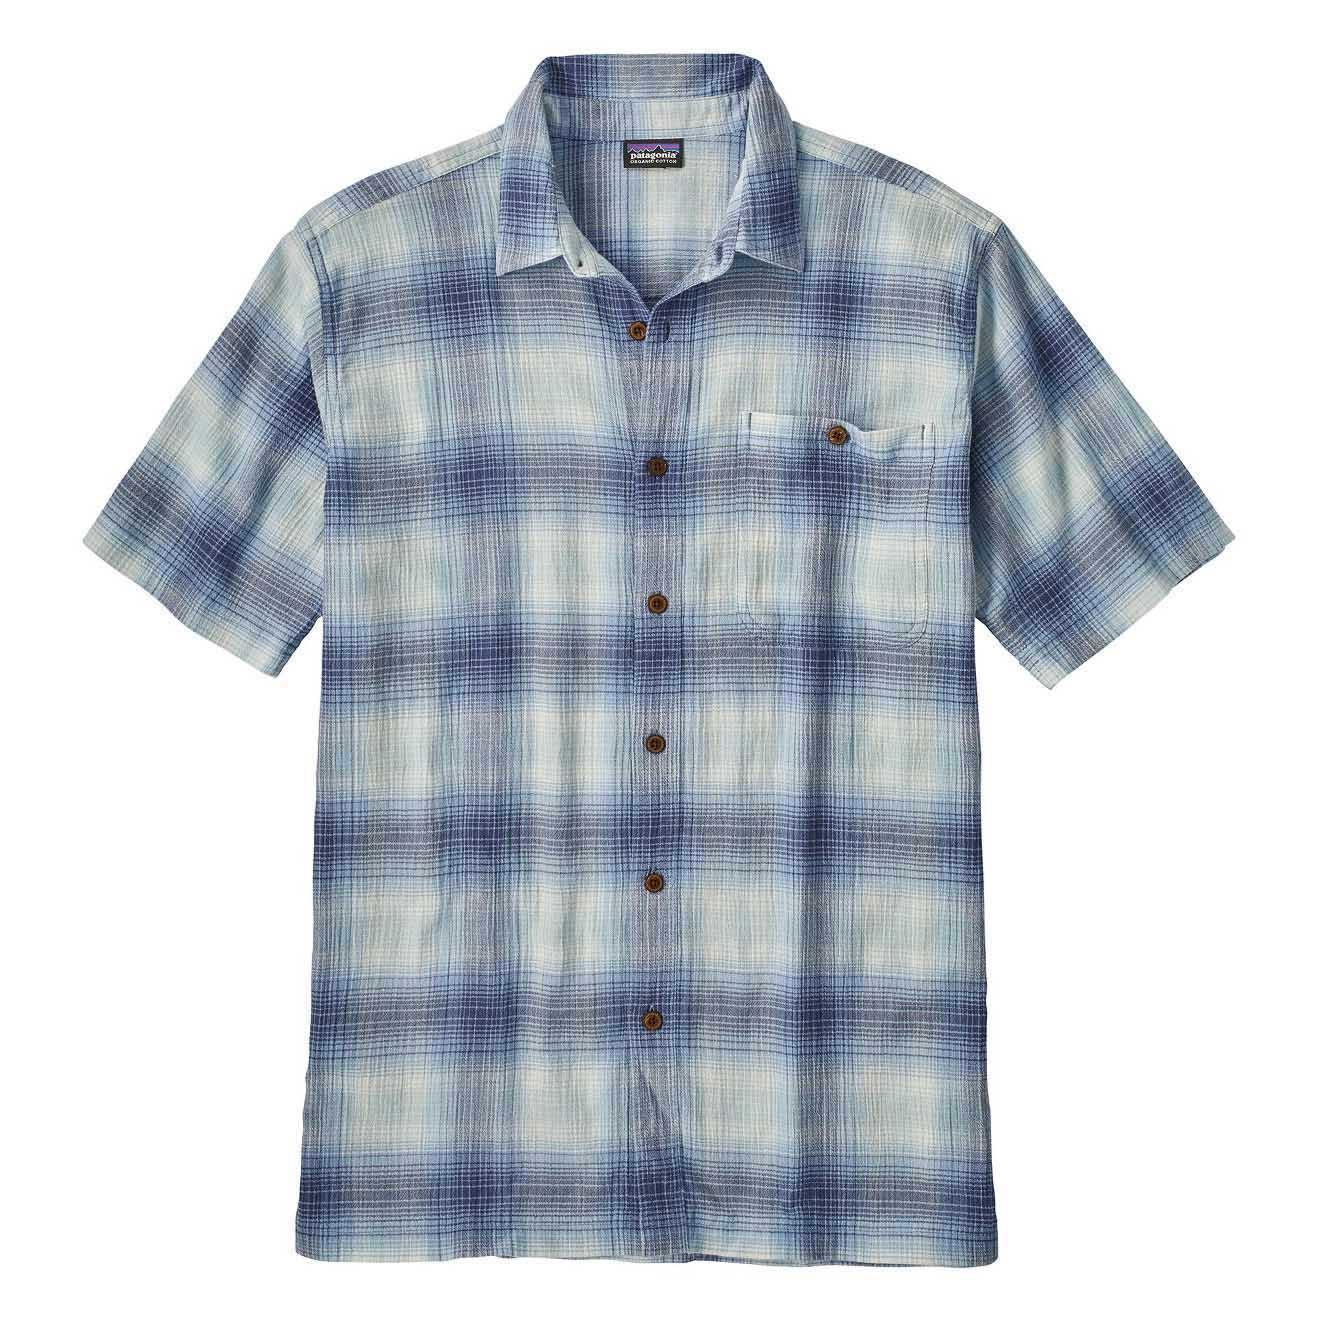 Patagonia A/C Shirt Railroad Blue